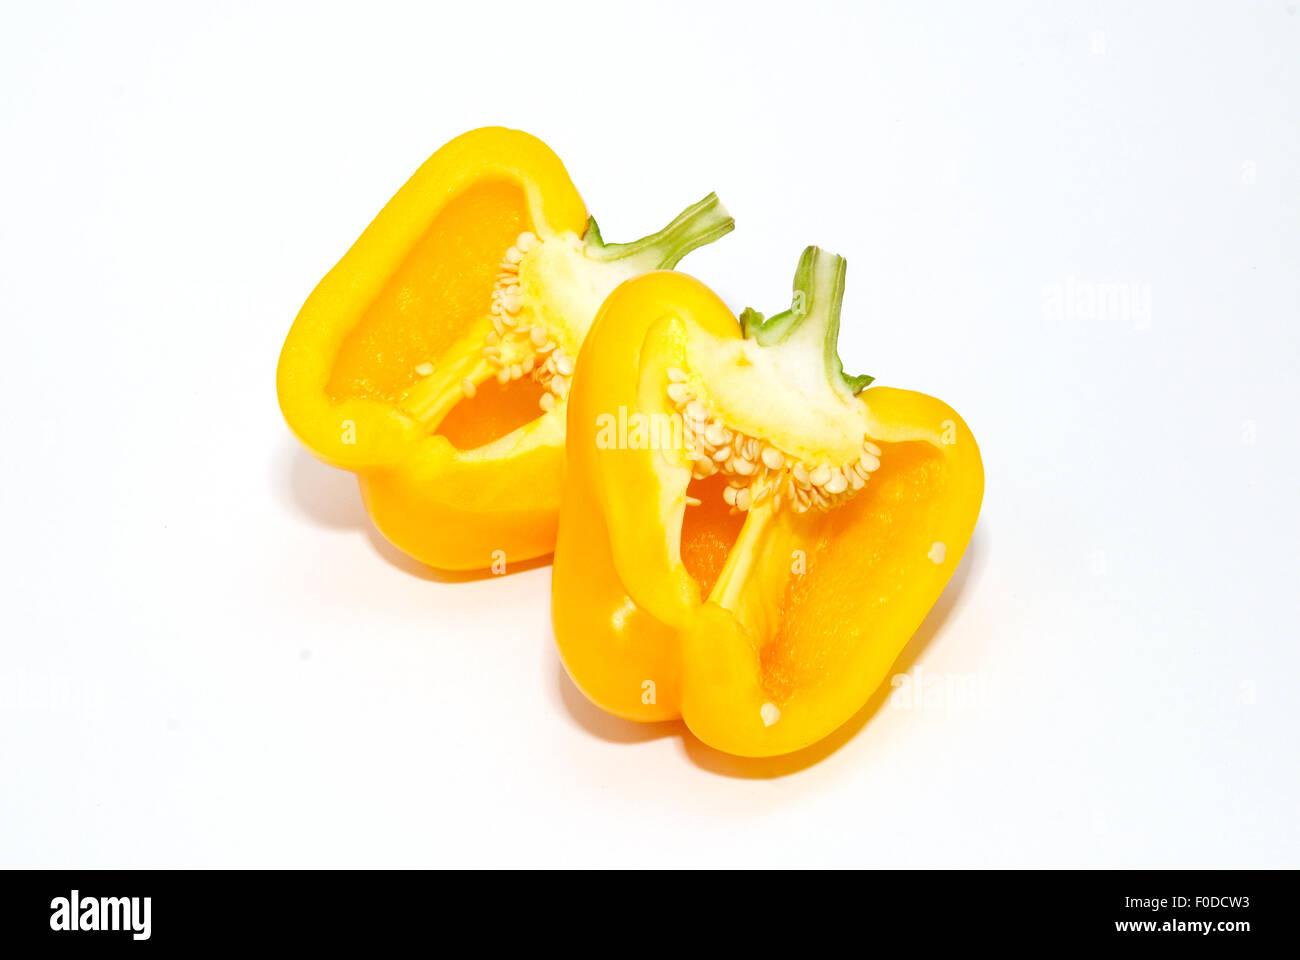 Two halves of slitting yellow paprika isolated on white. - Stock Image